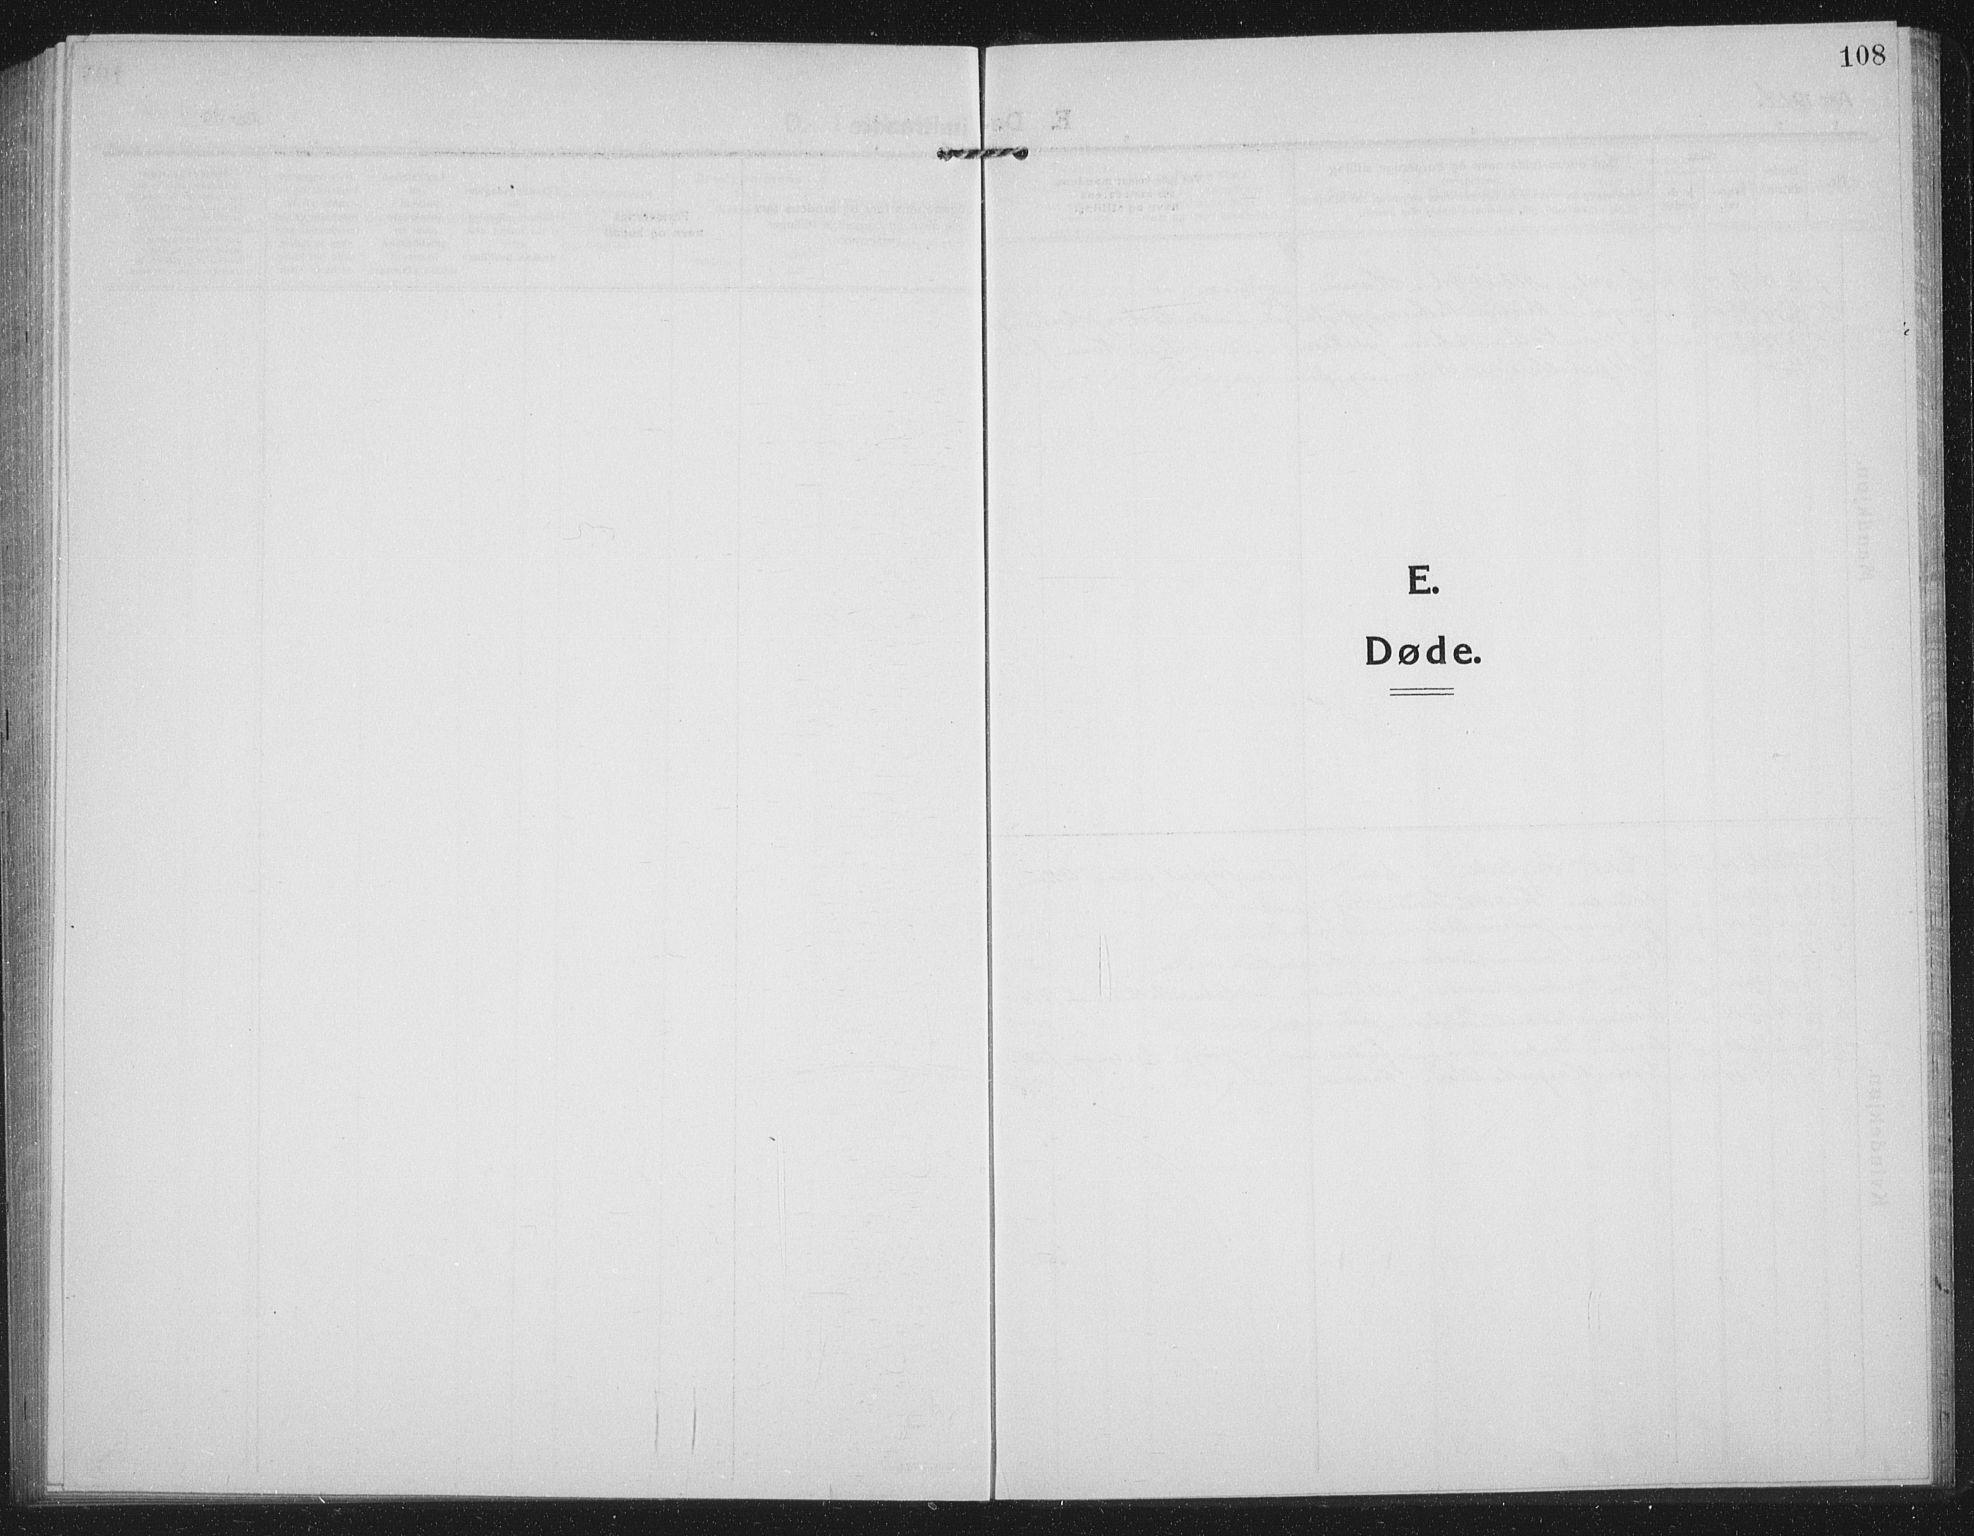 SATØ, Tranøy sokneprestkontor, I/Ia/Iab/L0019klokker: Klokkerbok nr. 19, 1914-1940, s. 108